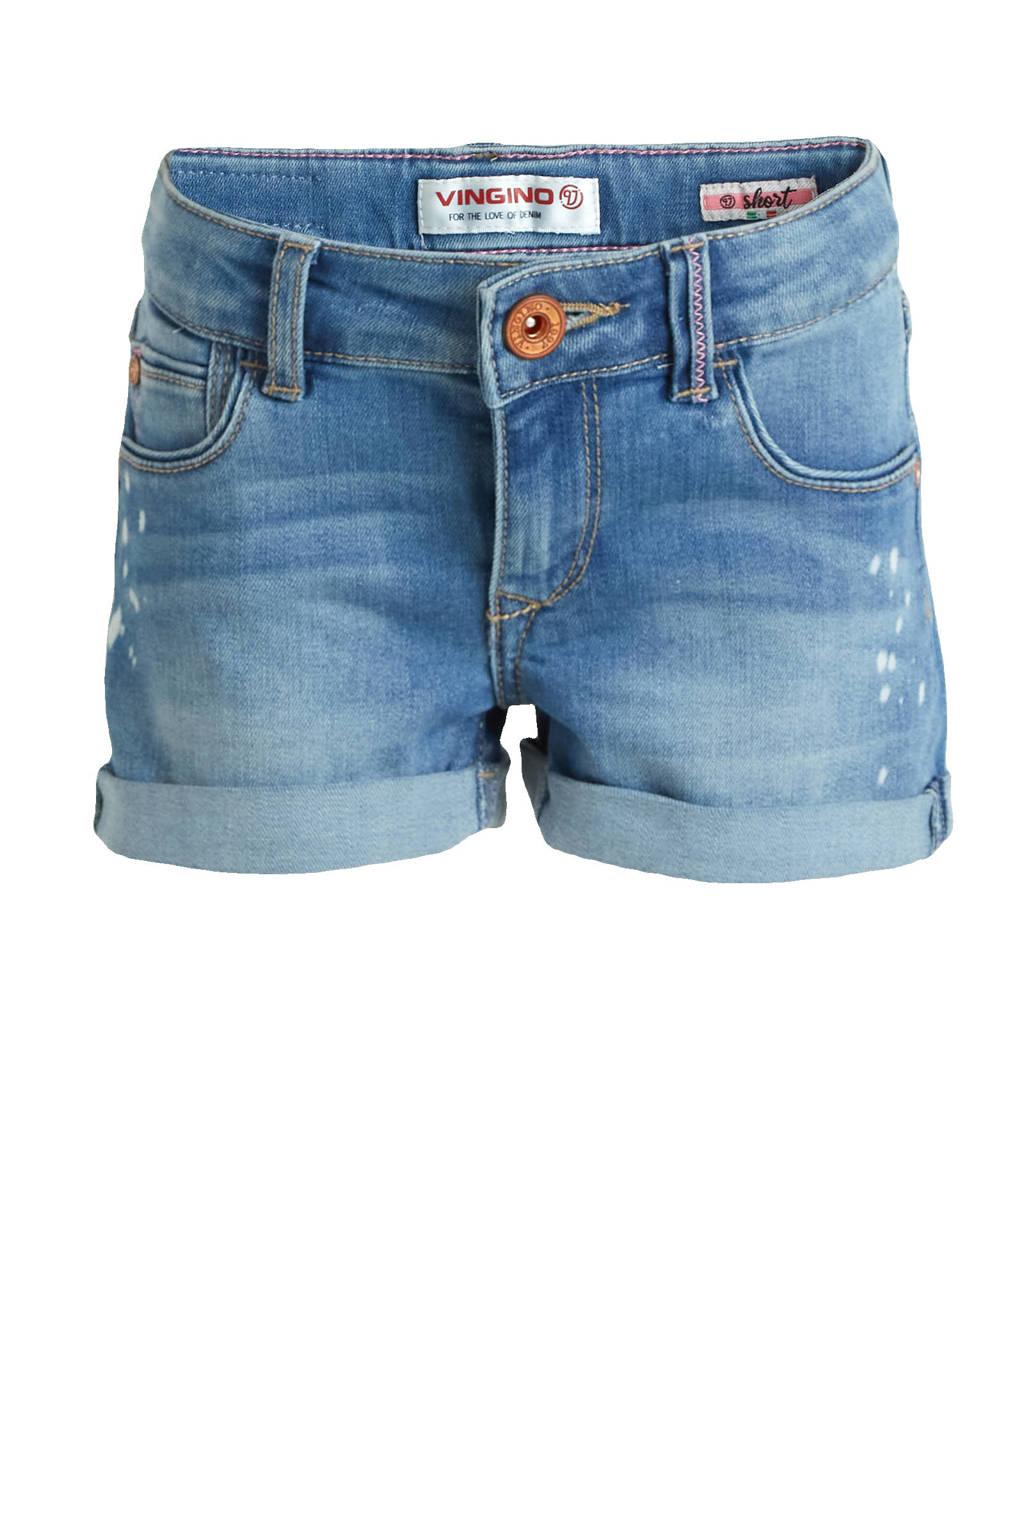 Vingino slim fit jeans short Dolomiti light vintage, Light vintage